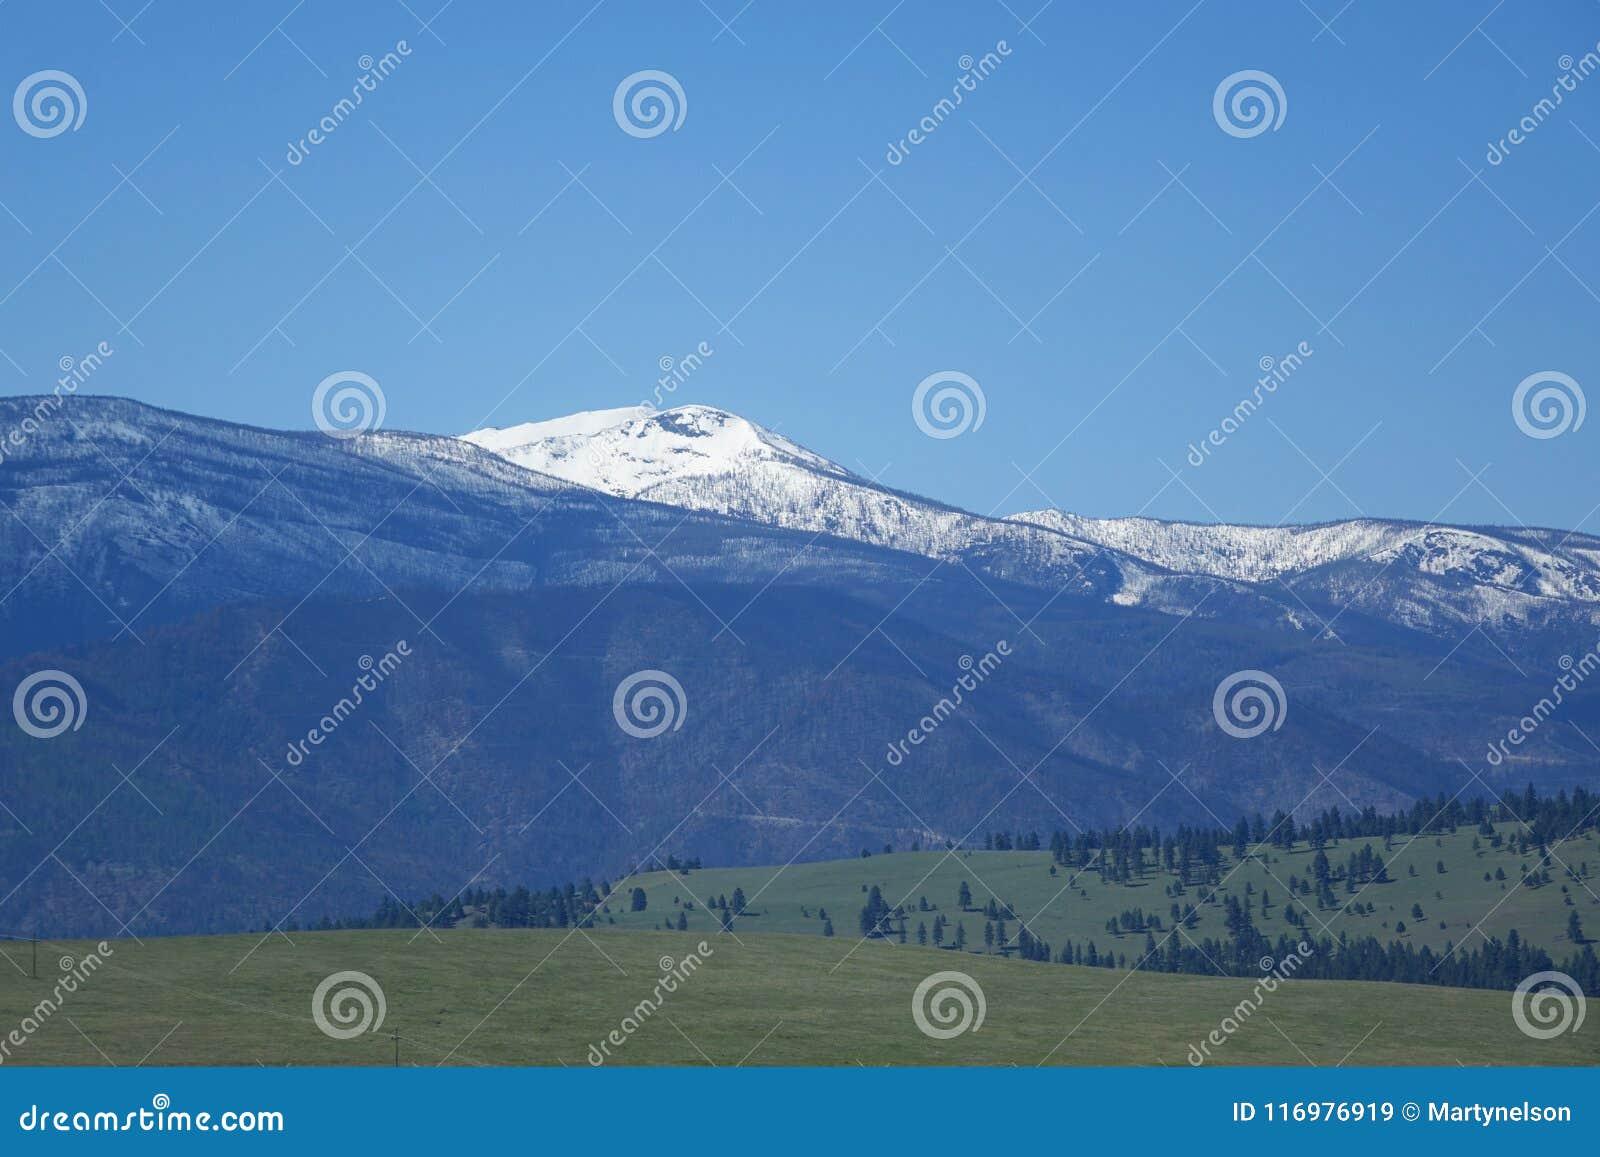 Montañas y bosques - Missoula, Montana